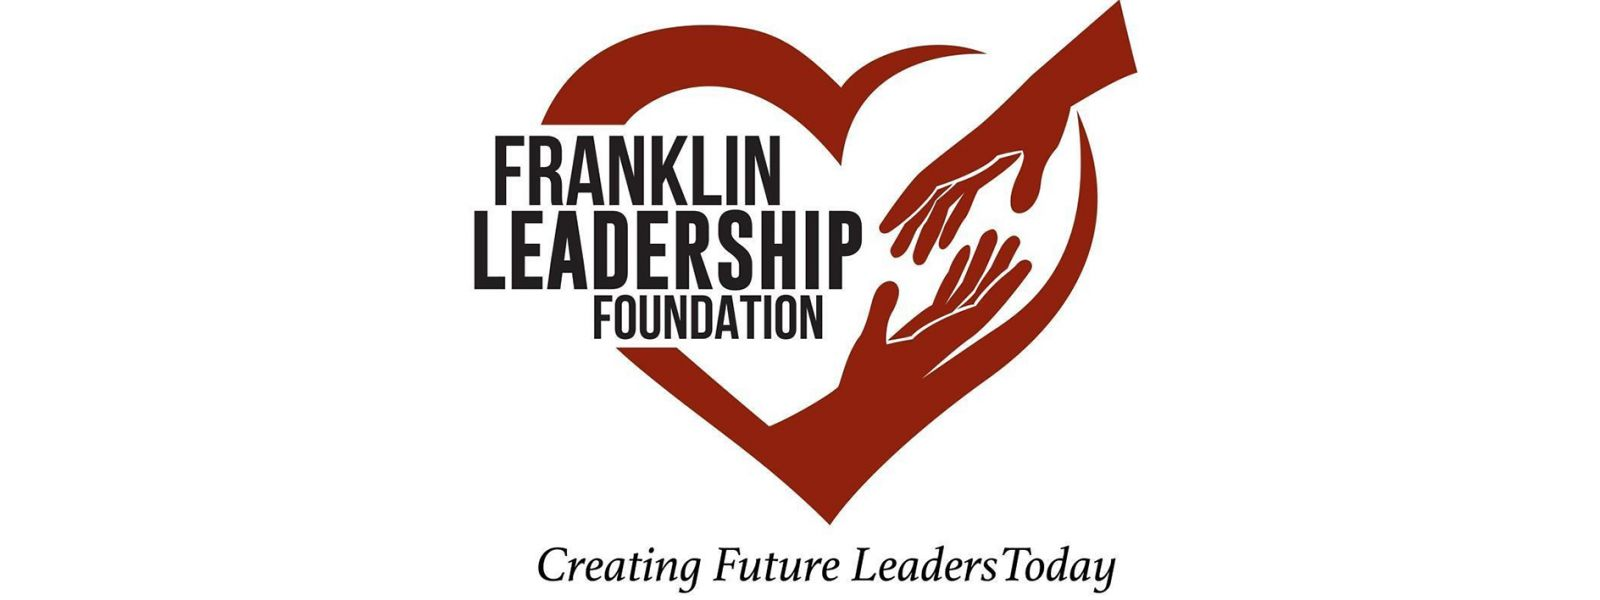 Franklin Leadership Foundation Logo